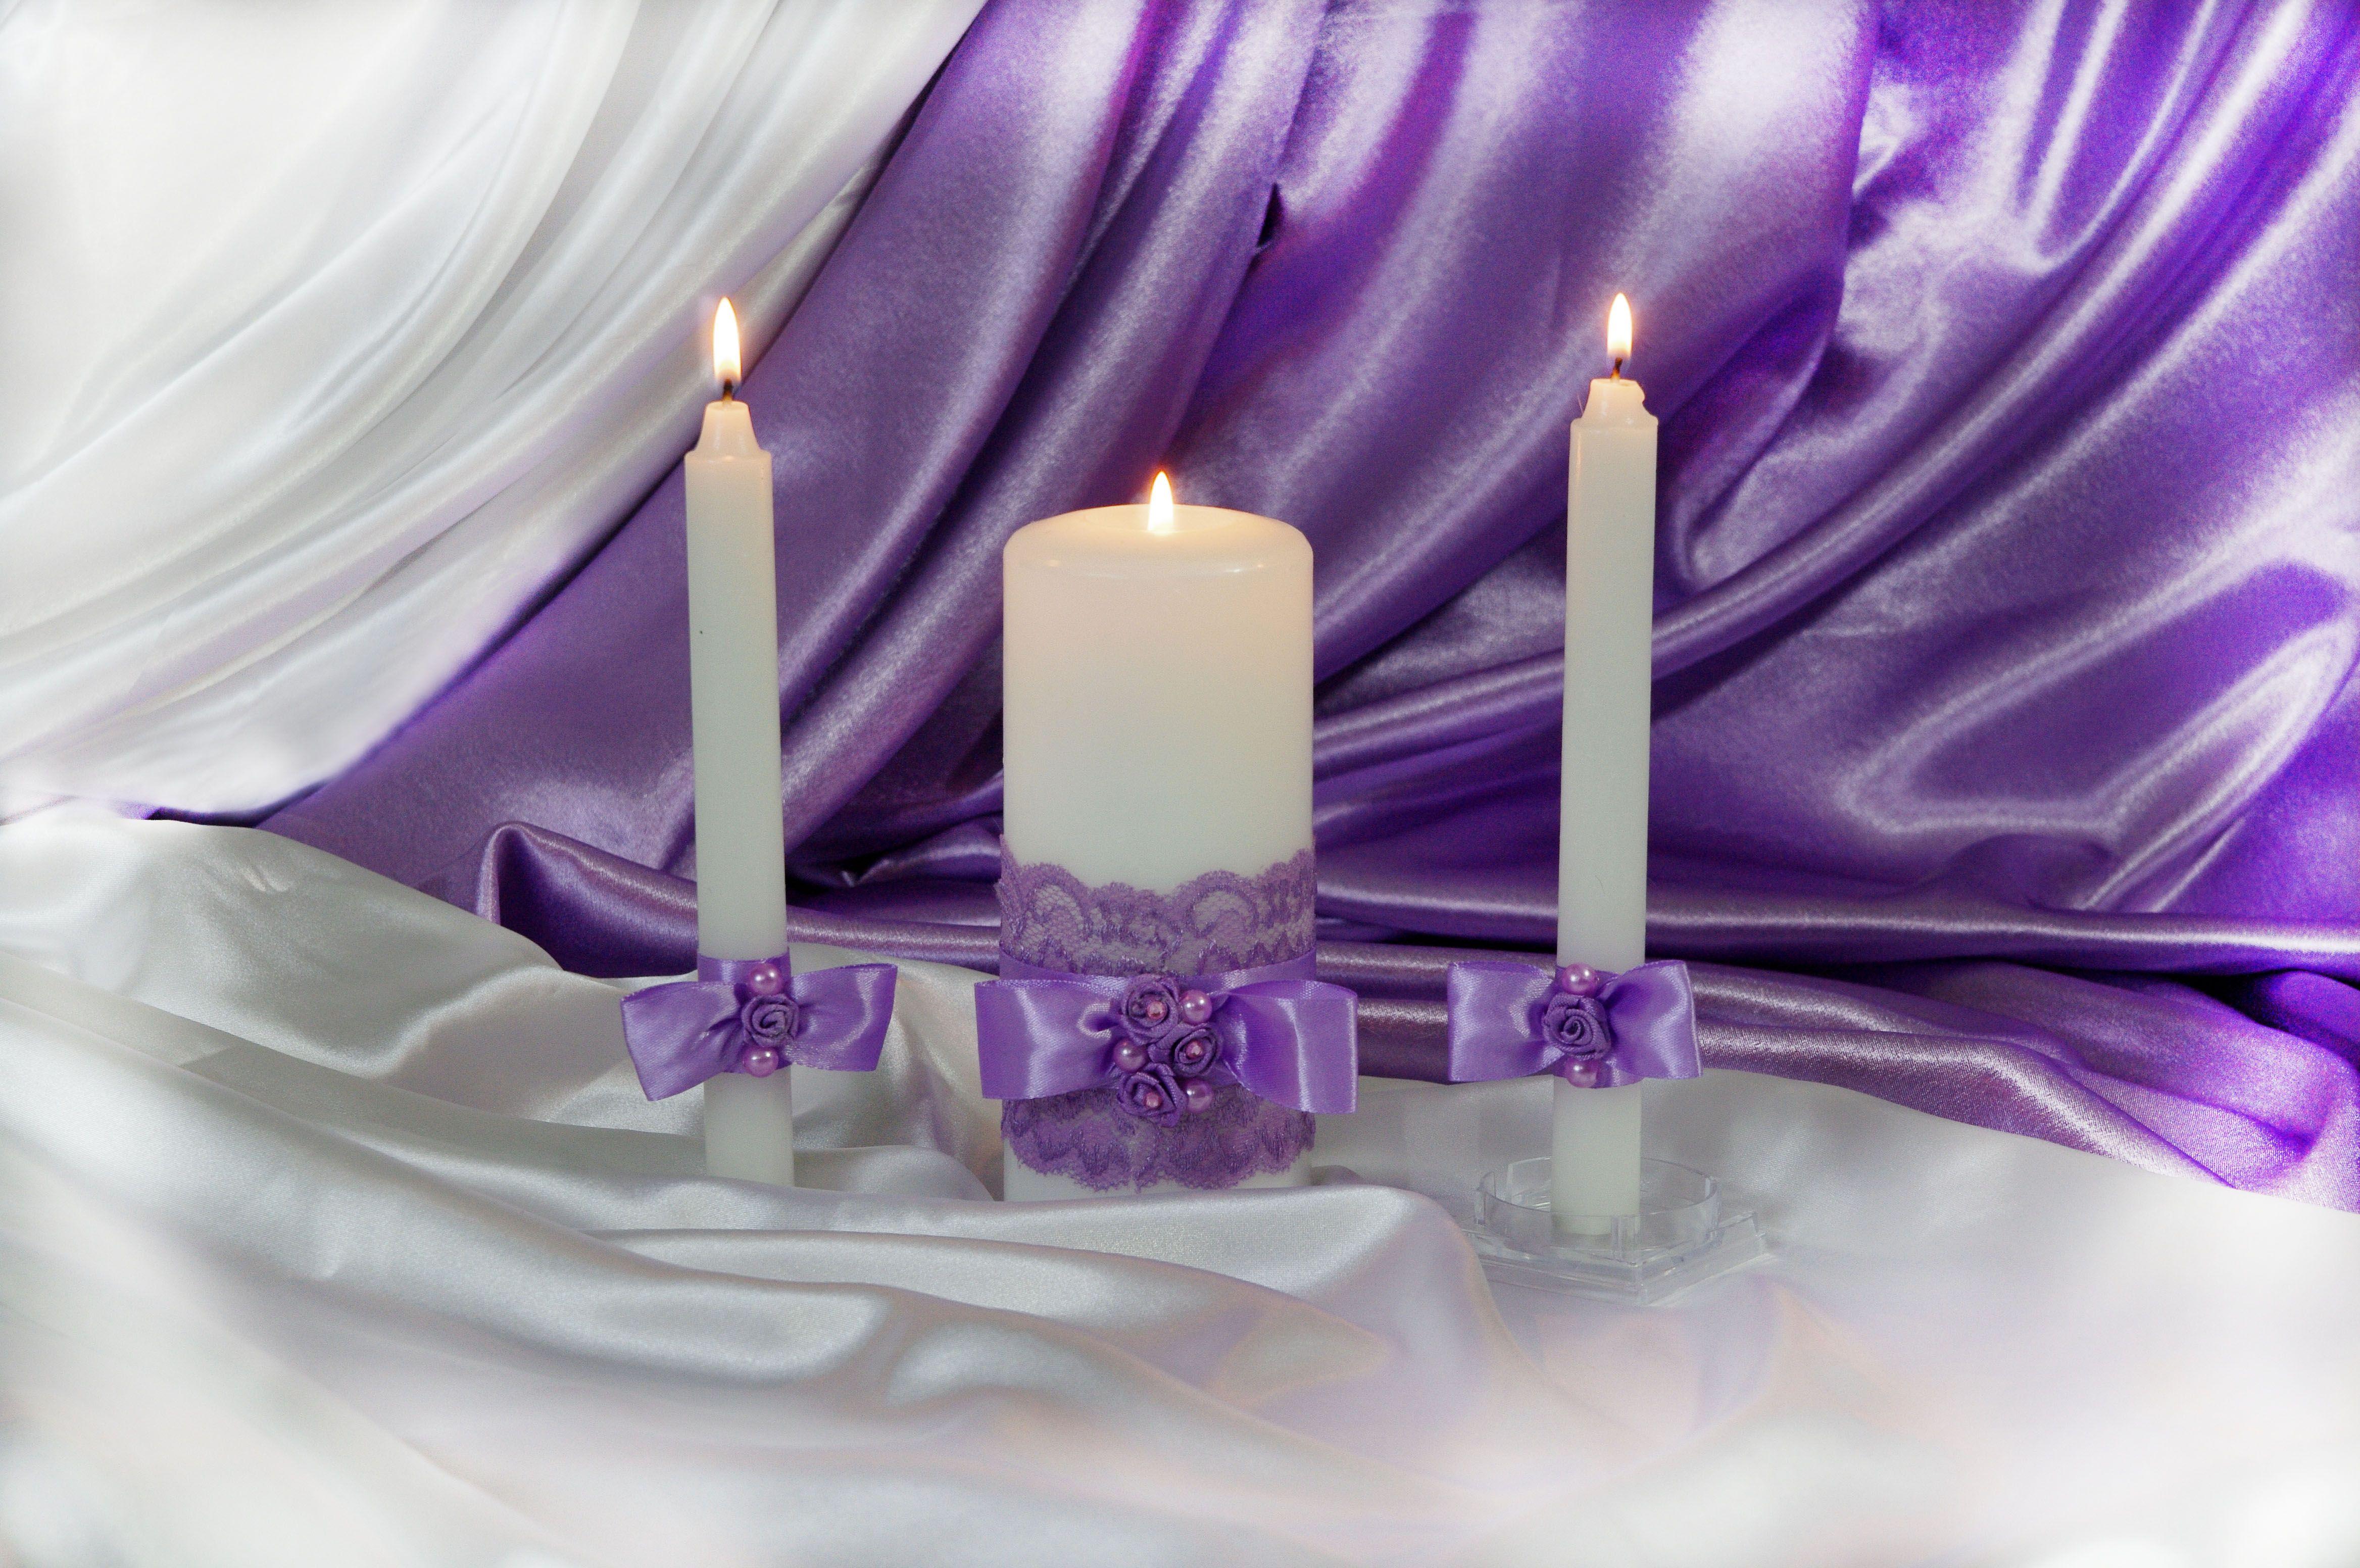 holiday candle rings violet gift set wedding bottle